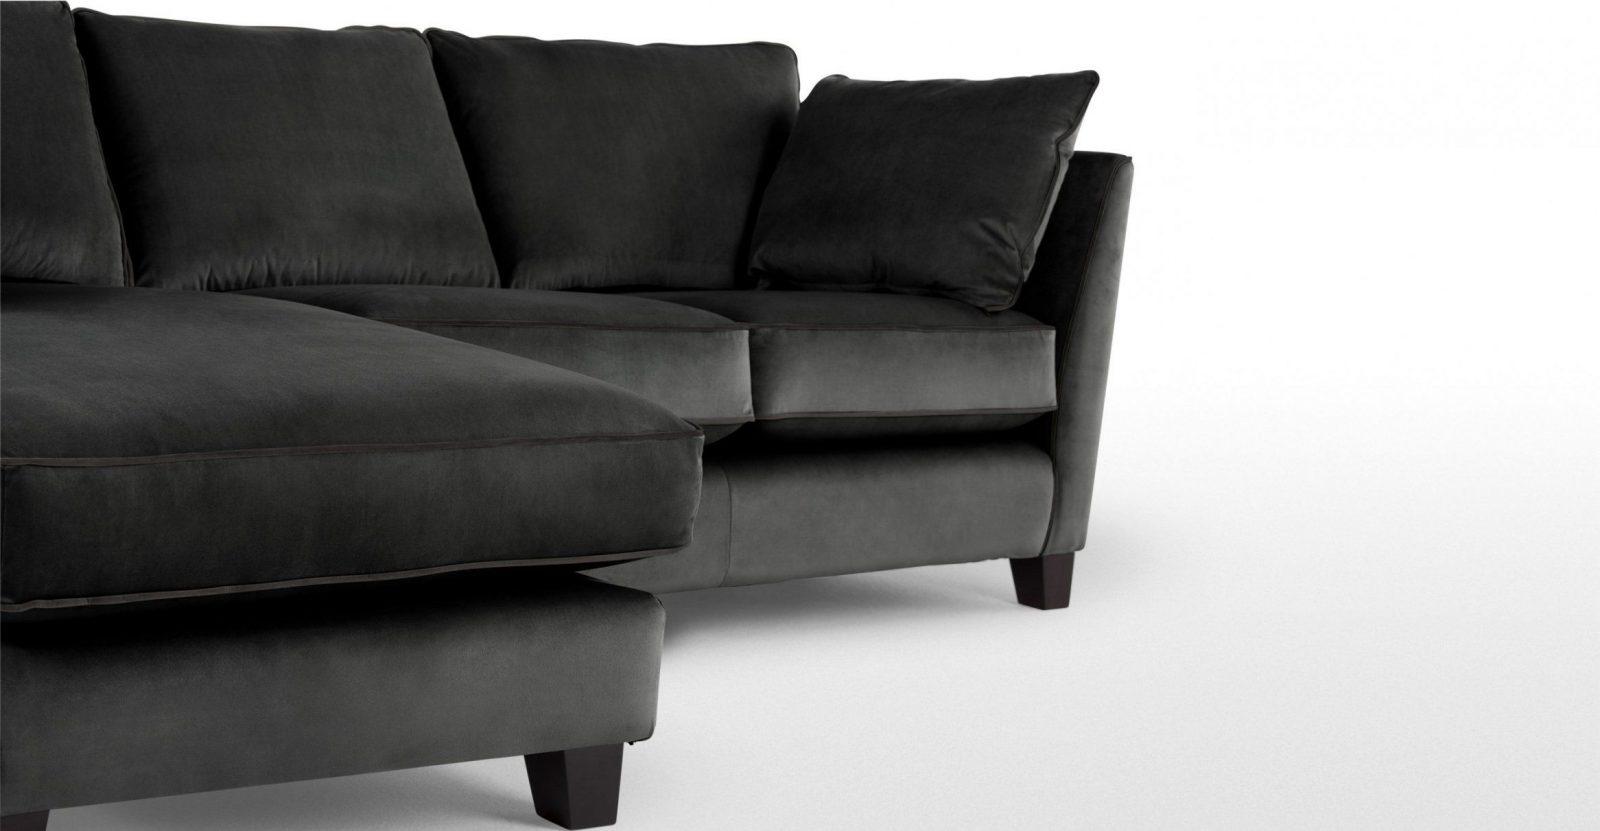 Genial Otto 2 Sitzer Sofa Affordable Opulent Ideas Sofa Grn Home von Otto 2 Sitzer Sofa Bild